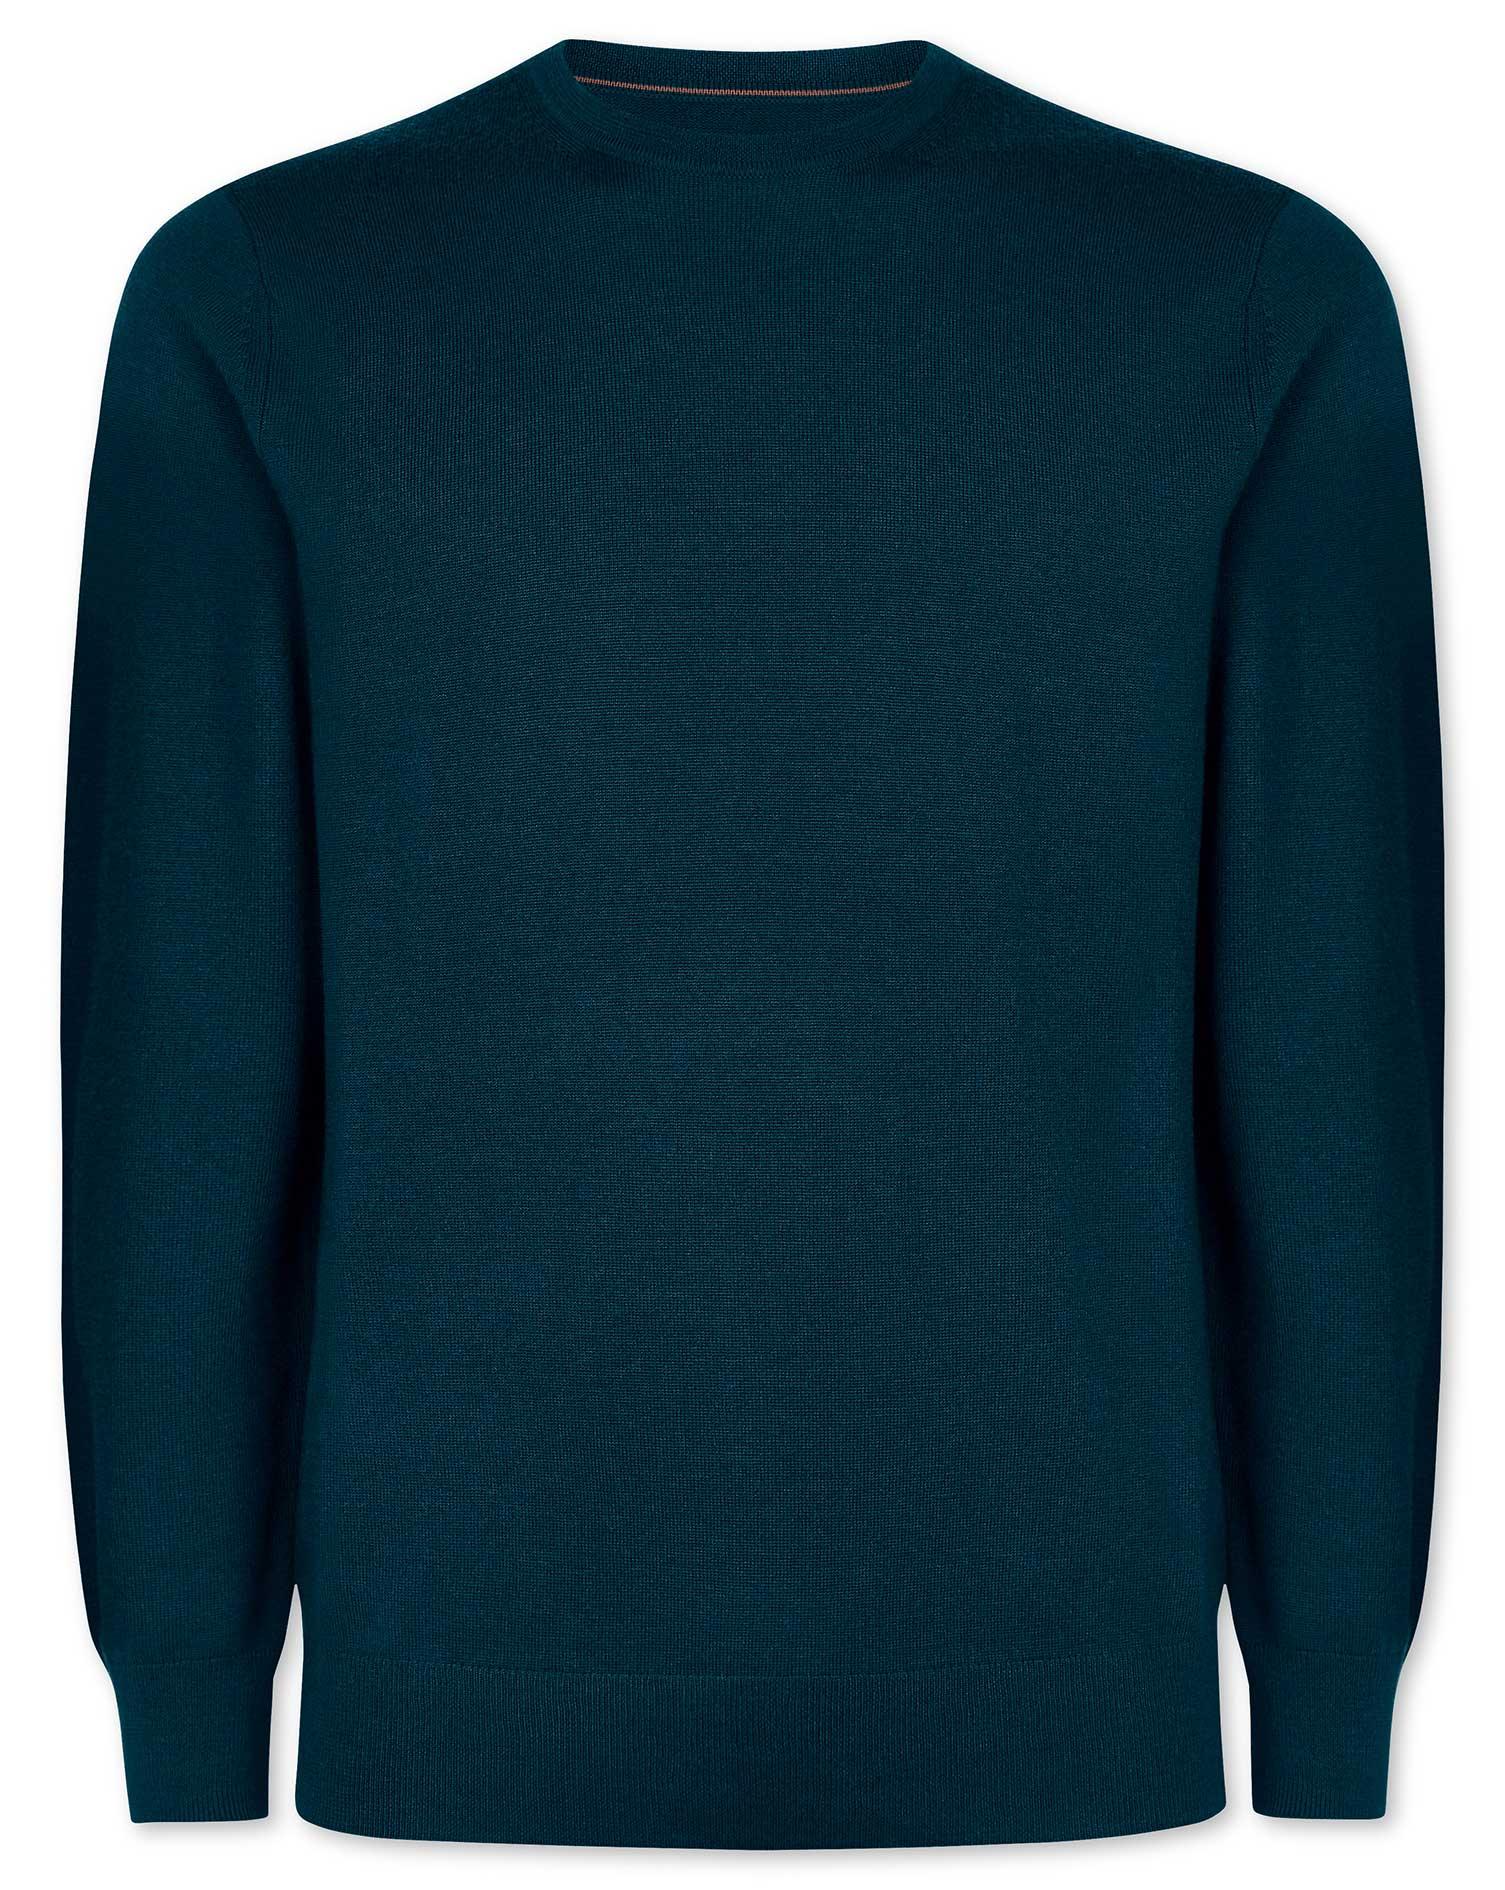 Teal Merino Crew Neck Wool Jumper Size XXXL by Charles Tyrwhitt